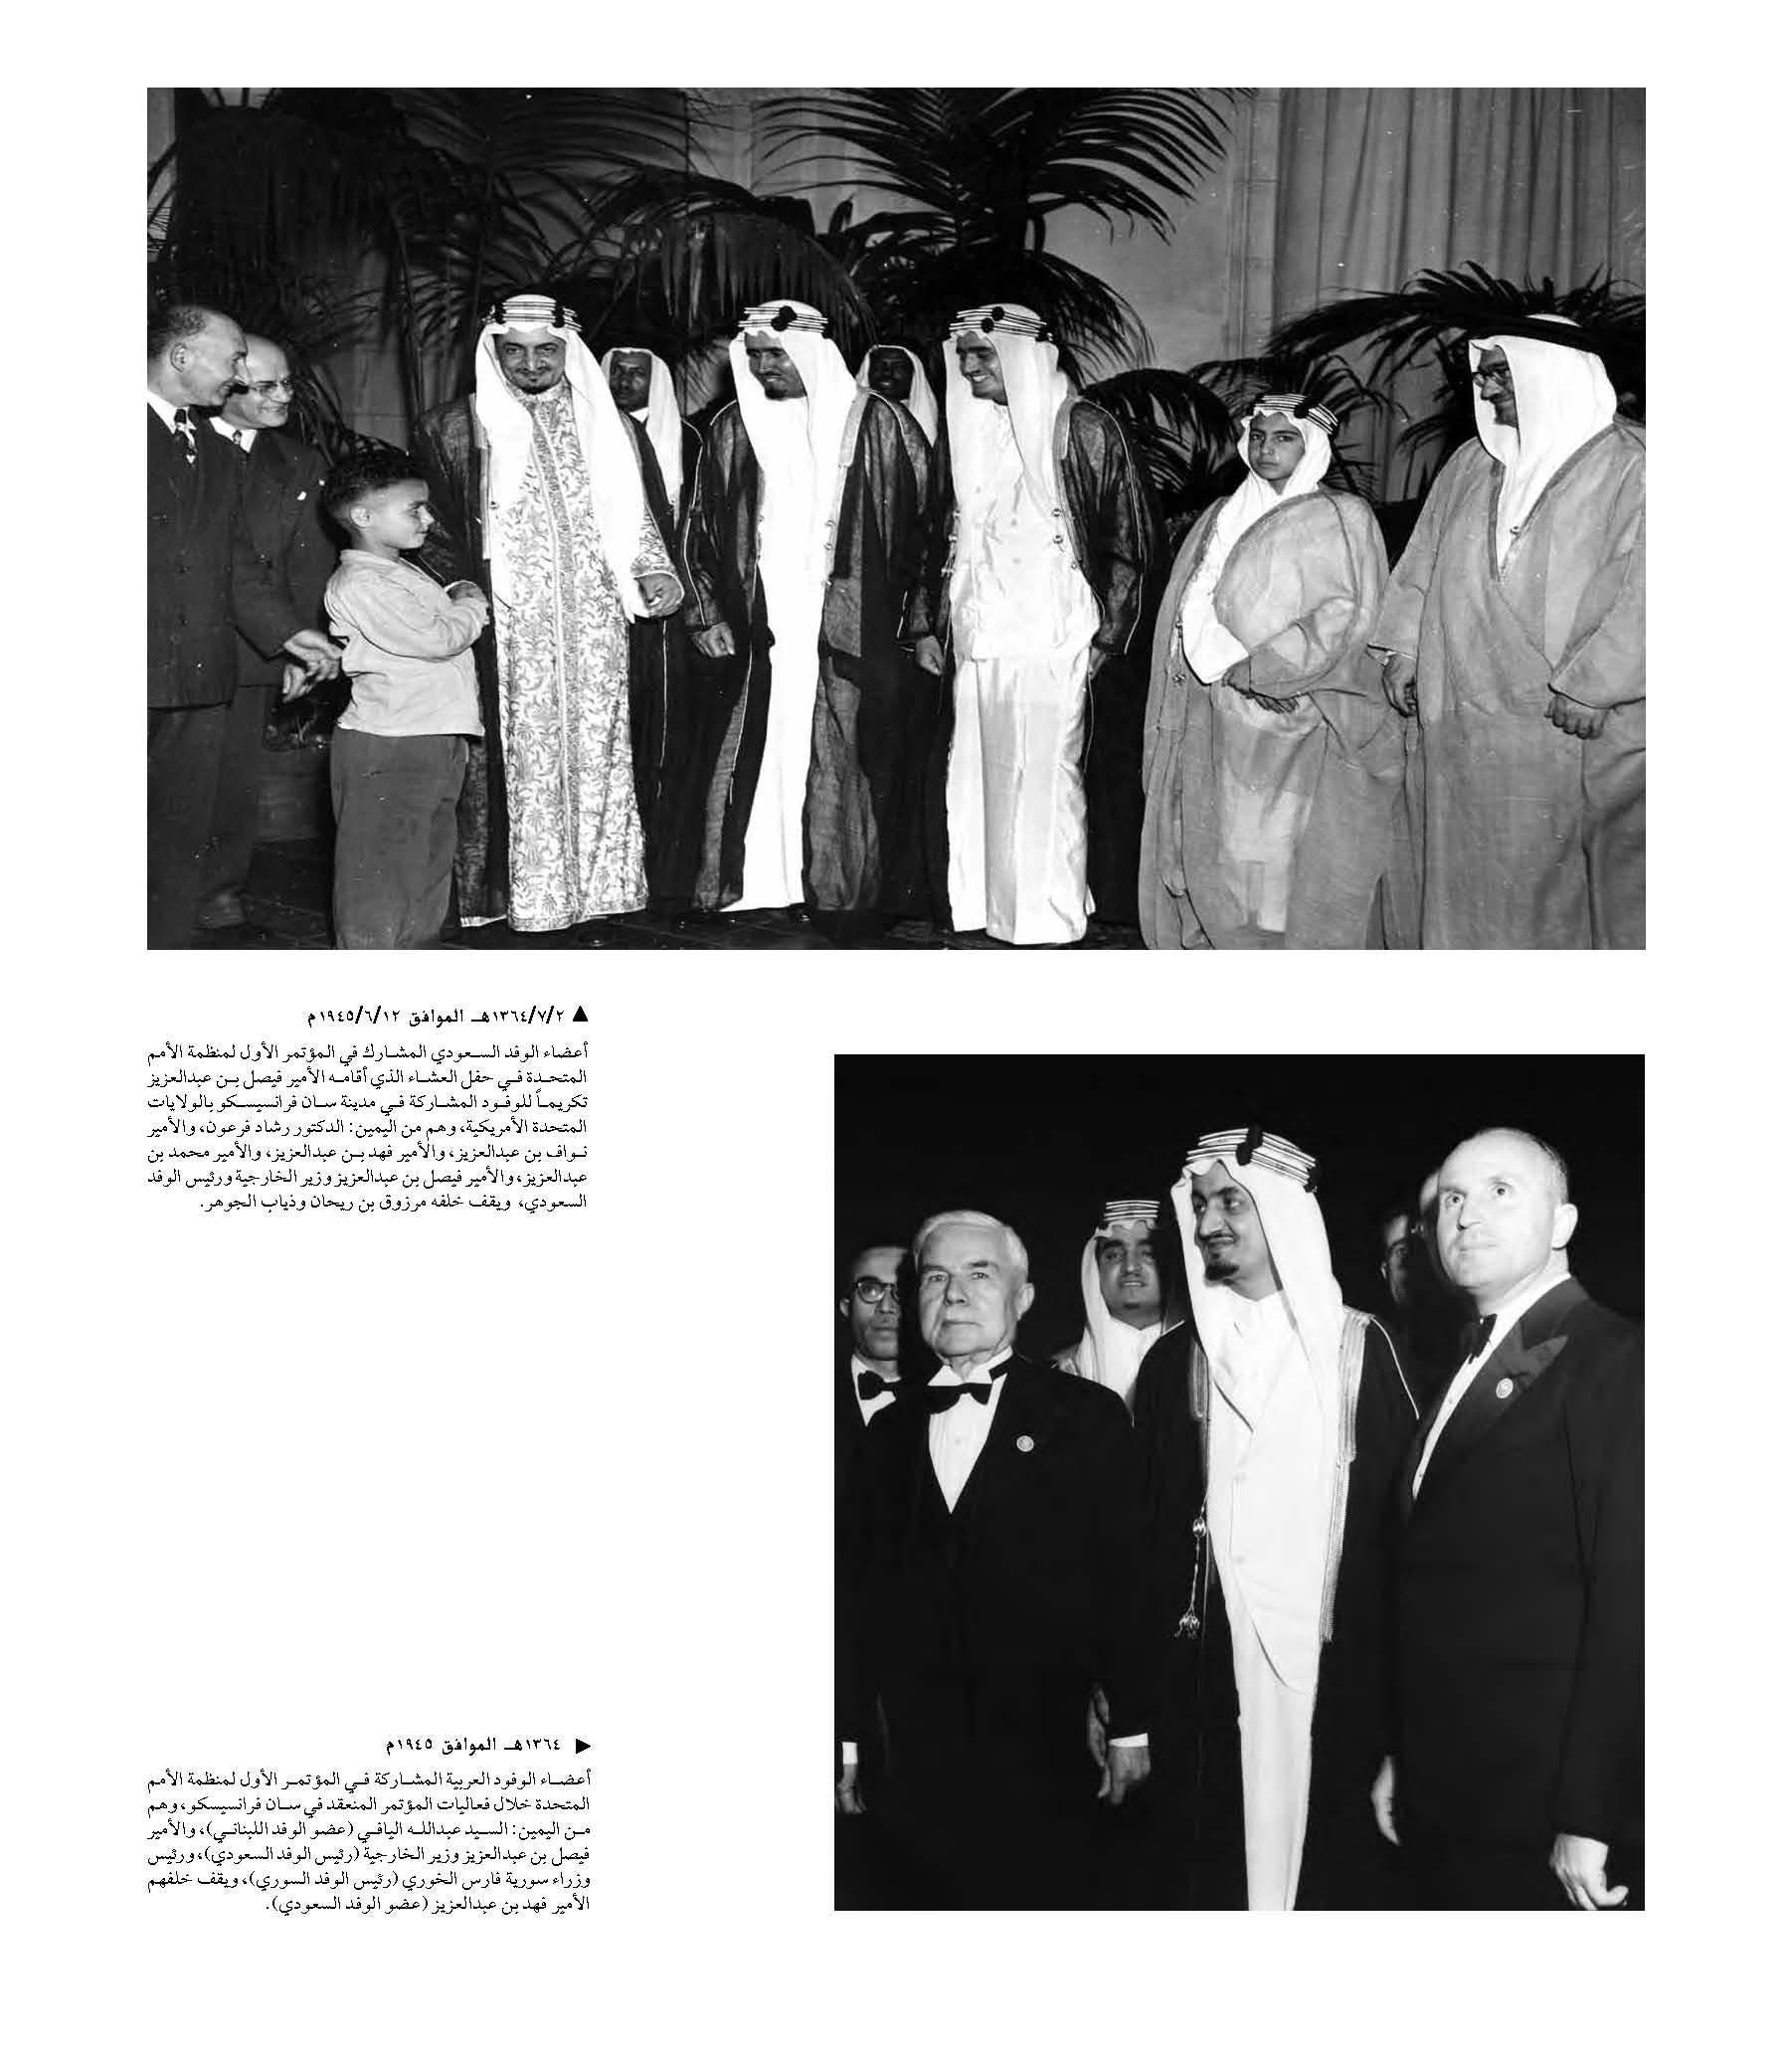 "صور نادرة للملك فهد في ""كتاب"" Ecd8509e-f593-46a6-8a80-c012f3e8c66a"